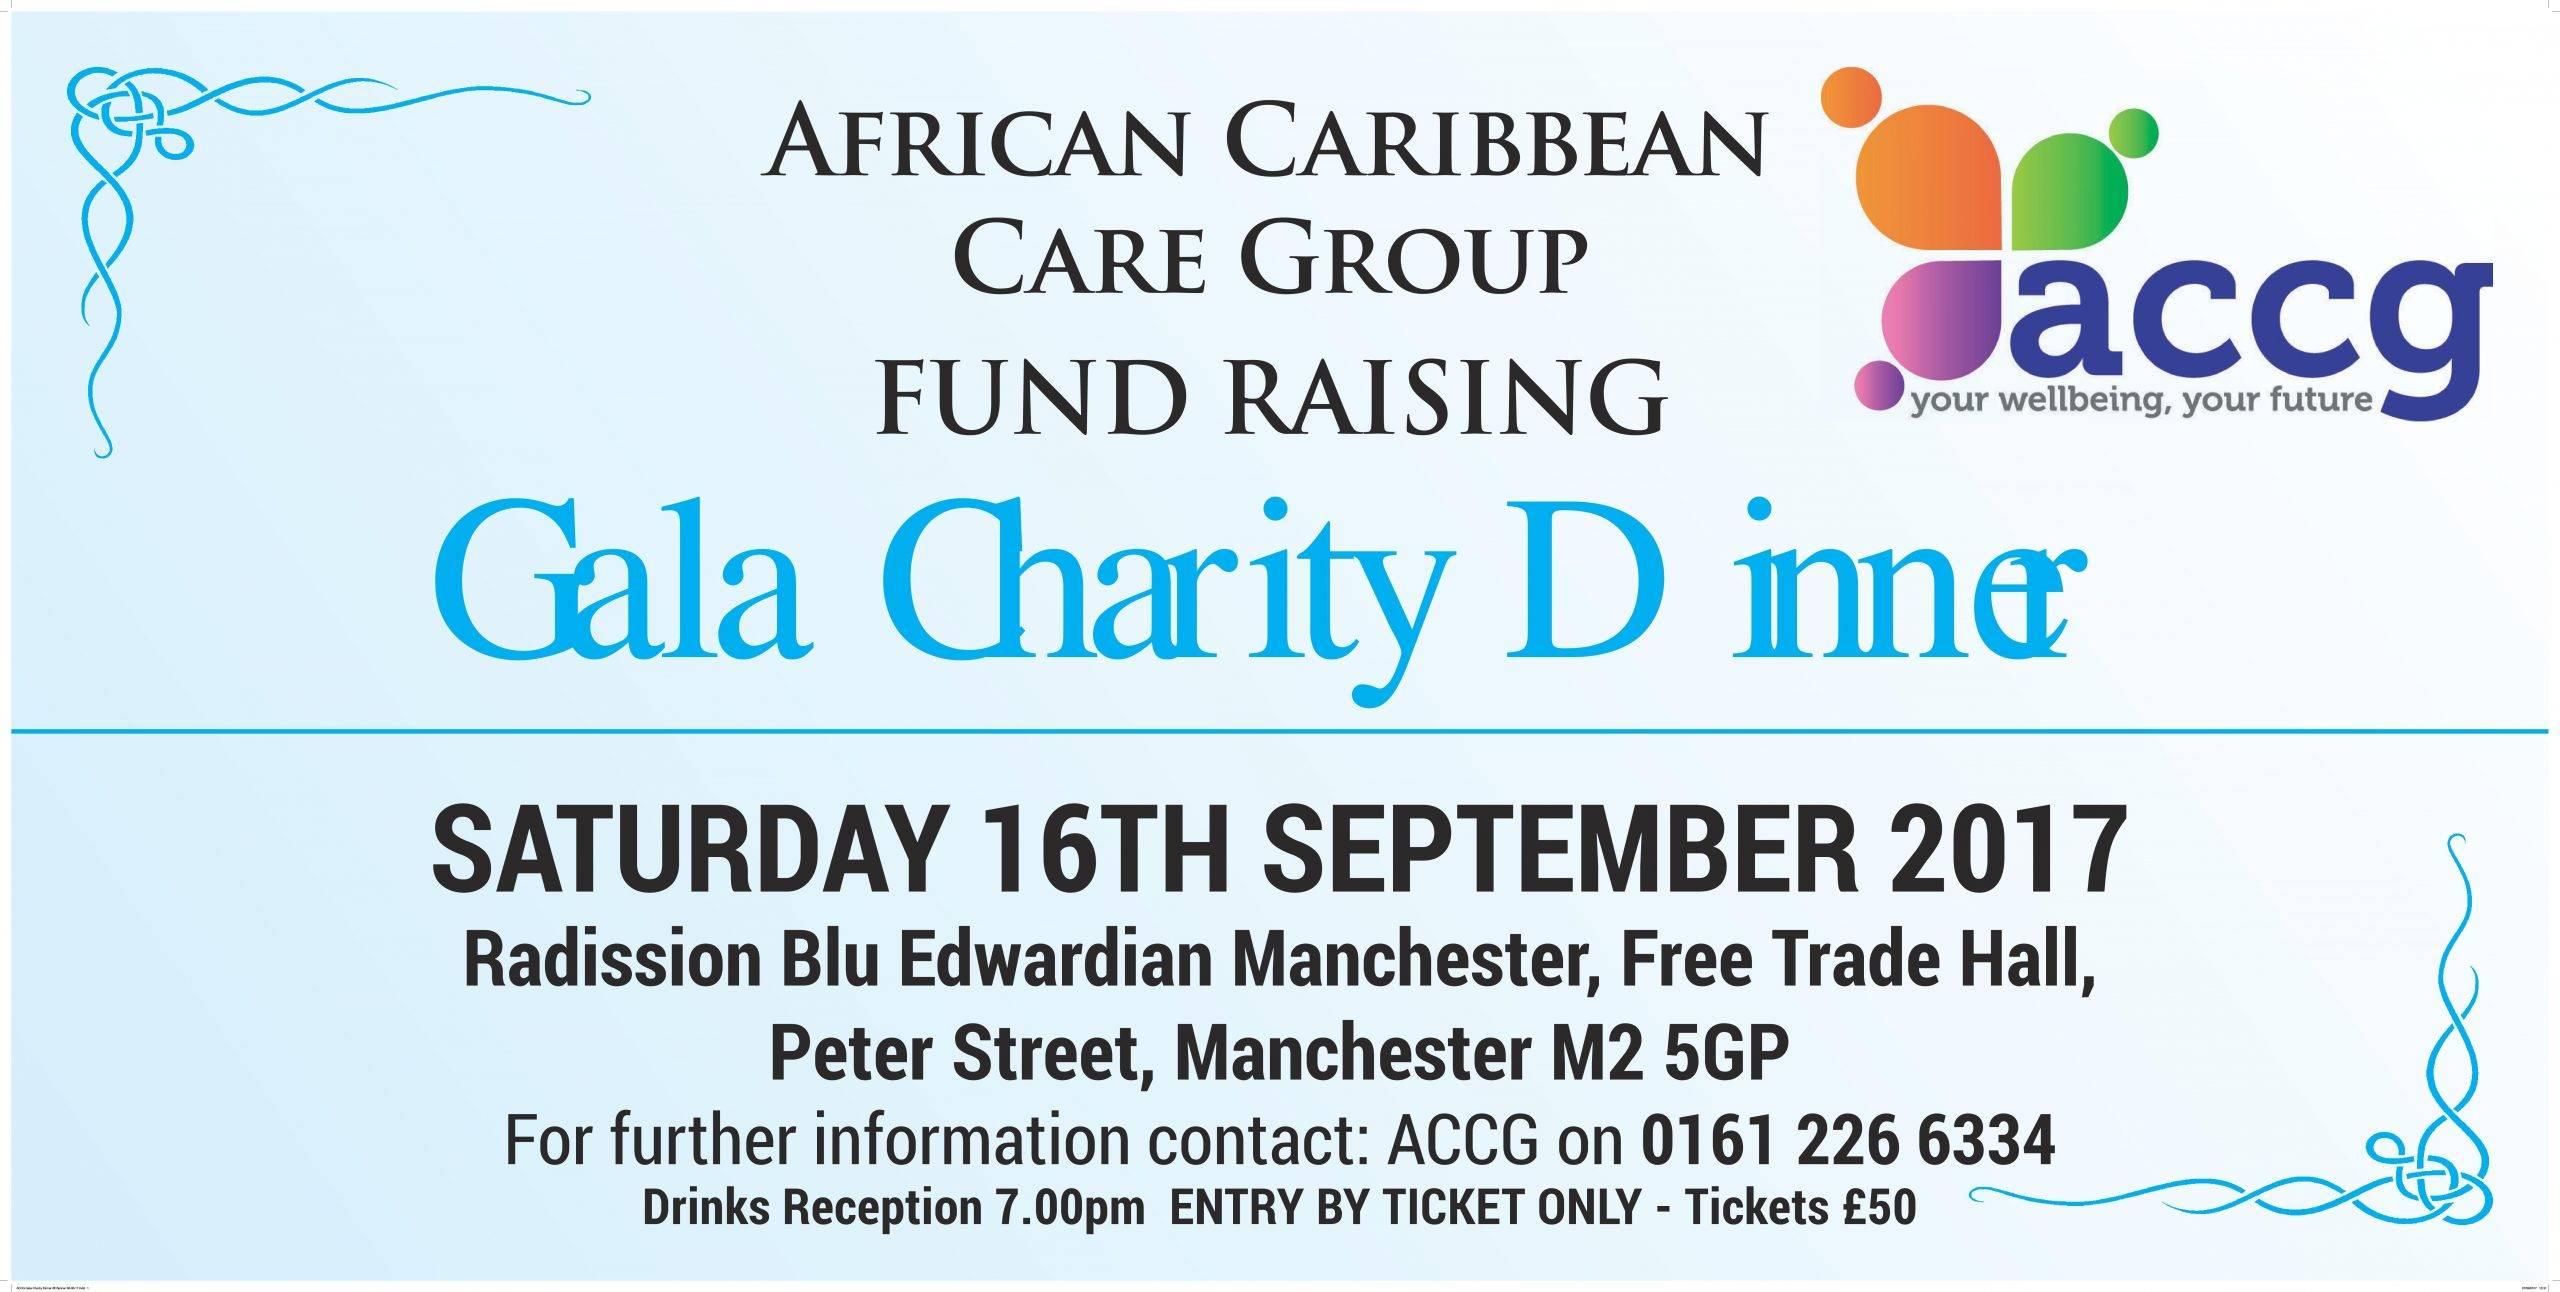 ACCG Fundraising Charity Dinner and Dance | Blacknet UK